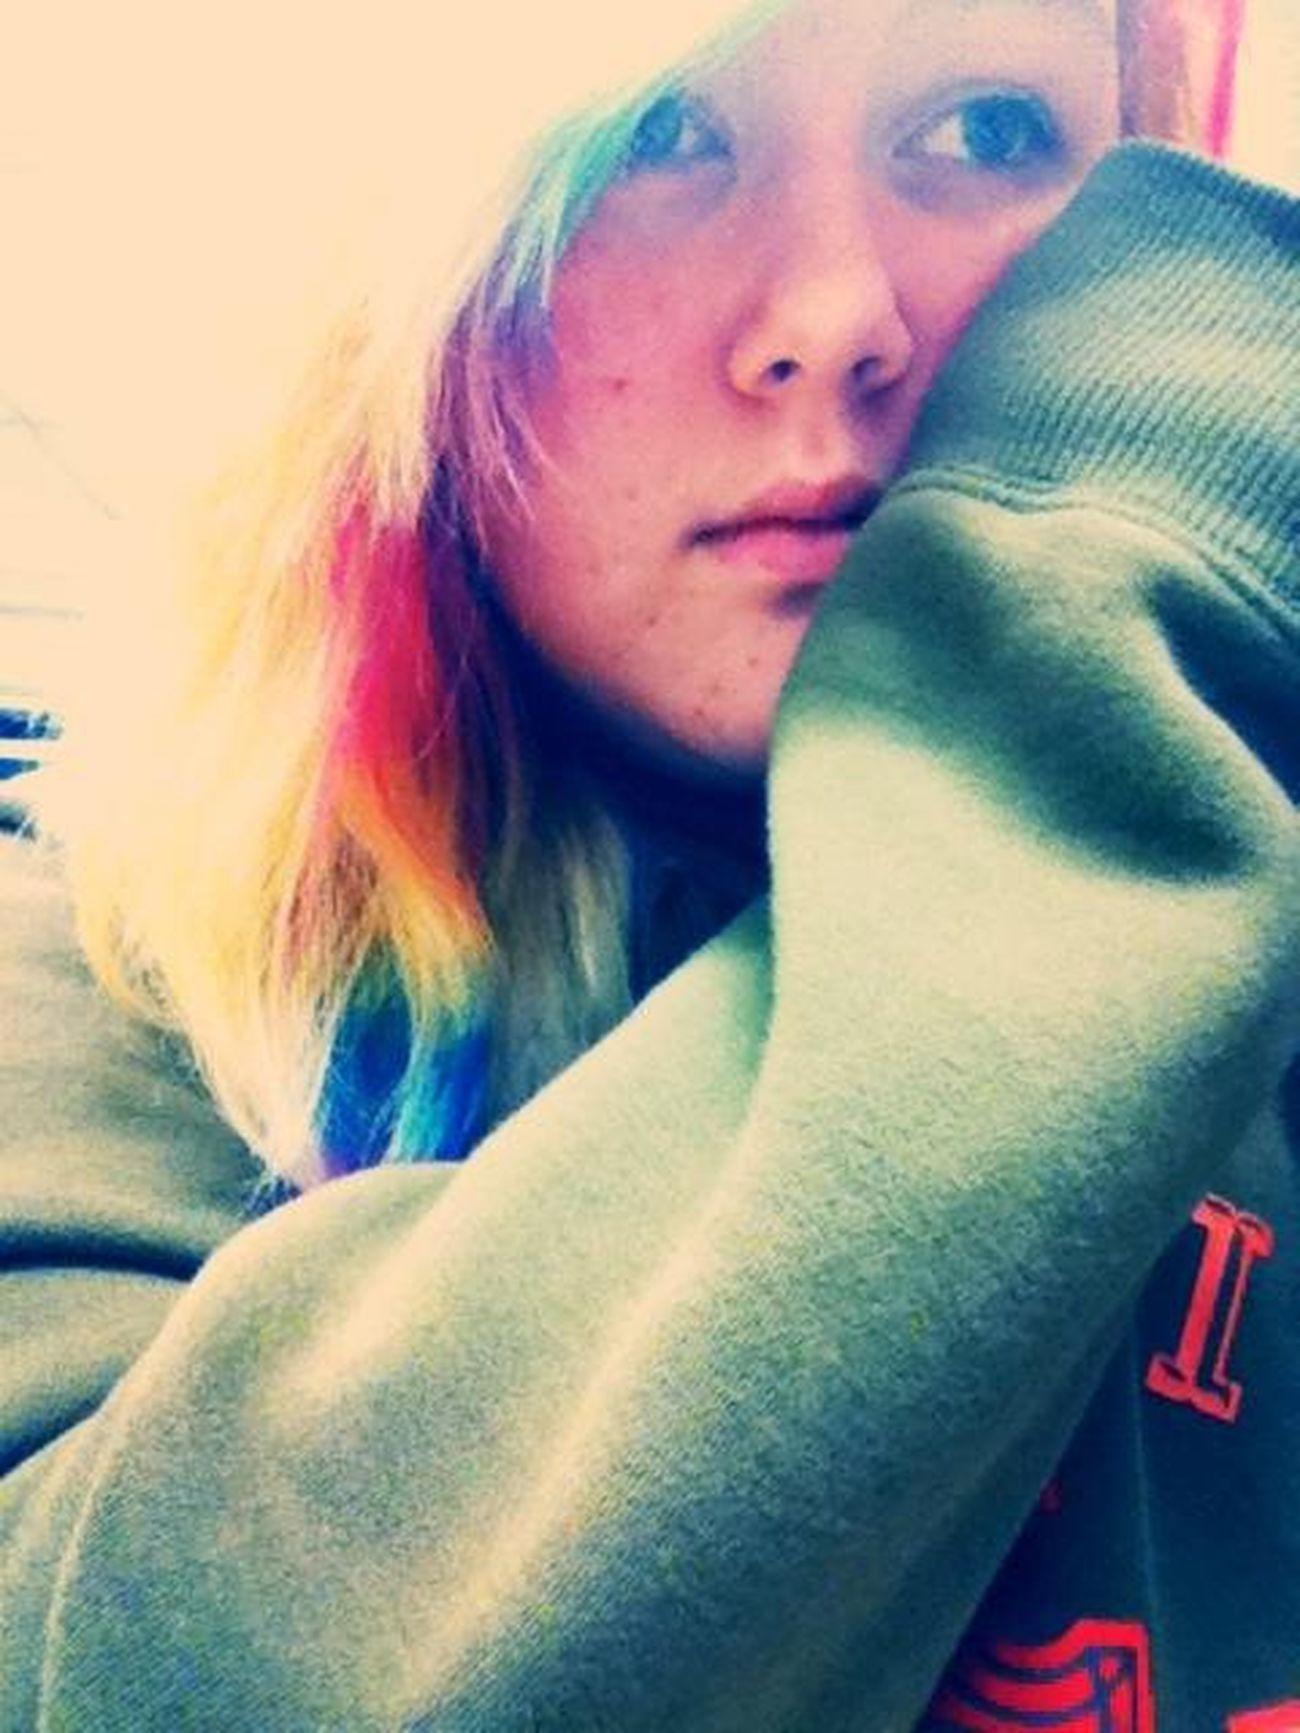 Being Rainbow